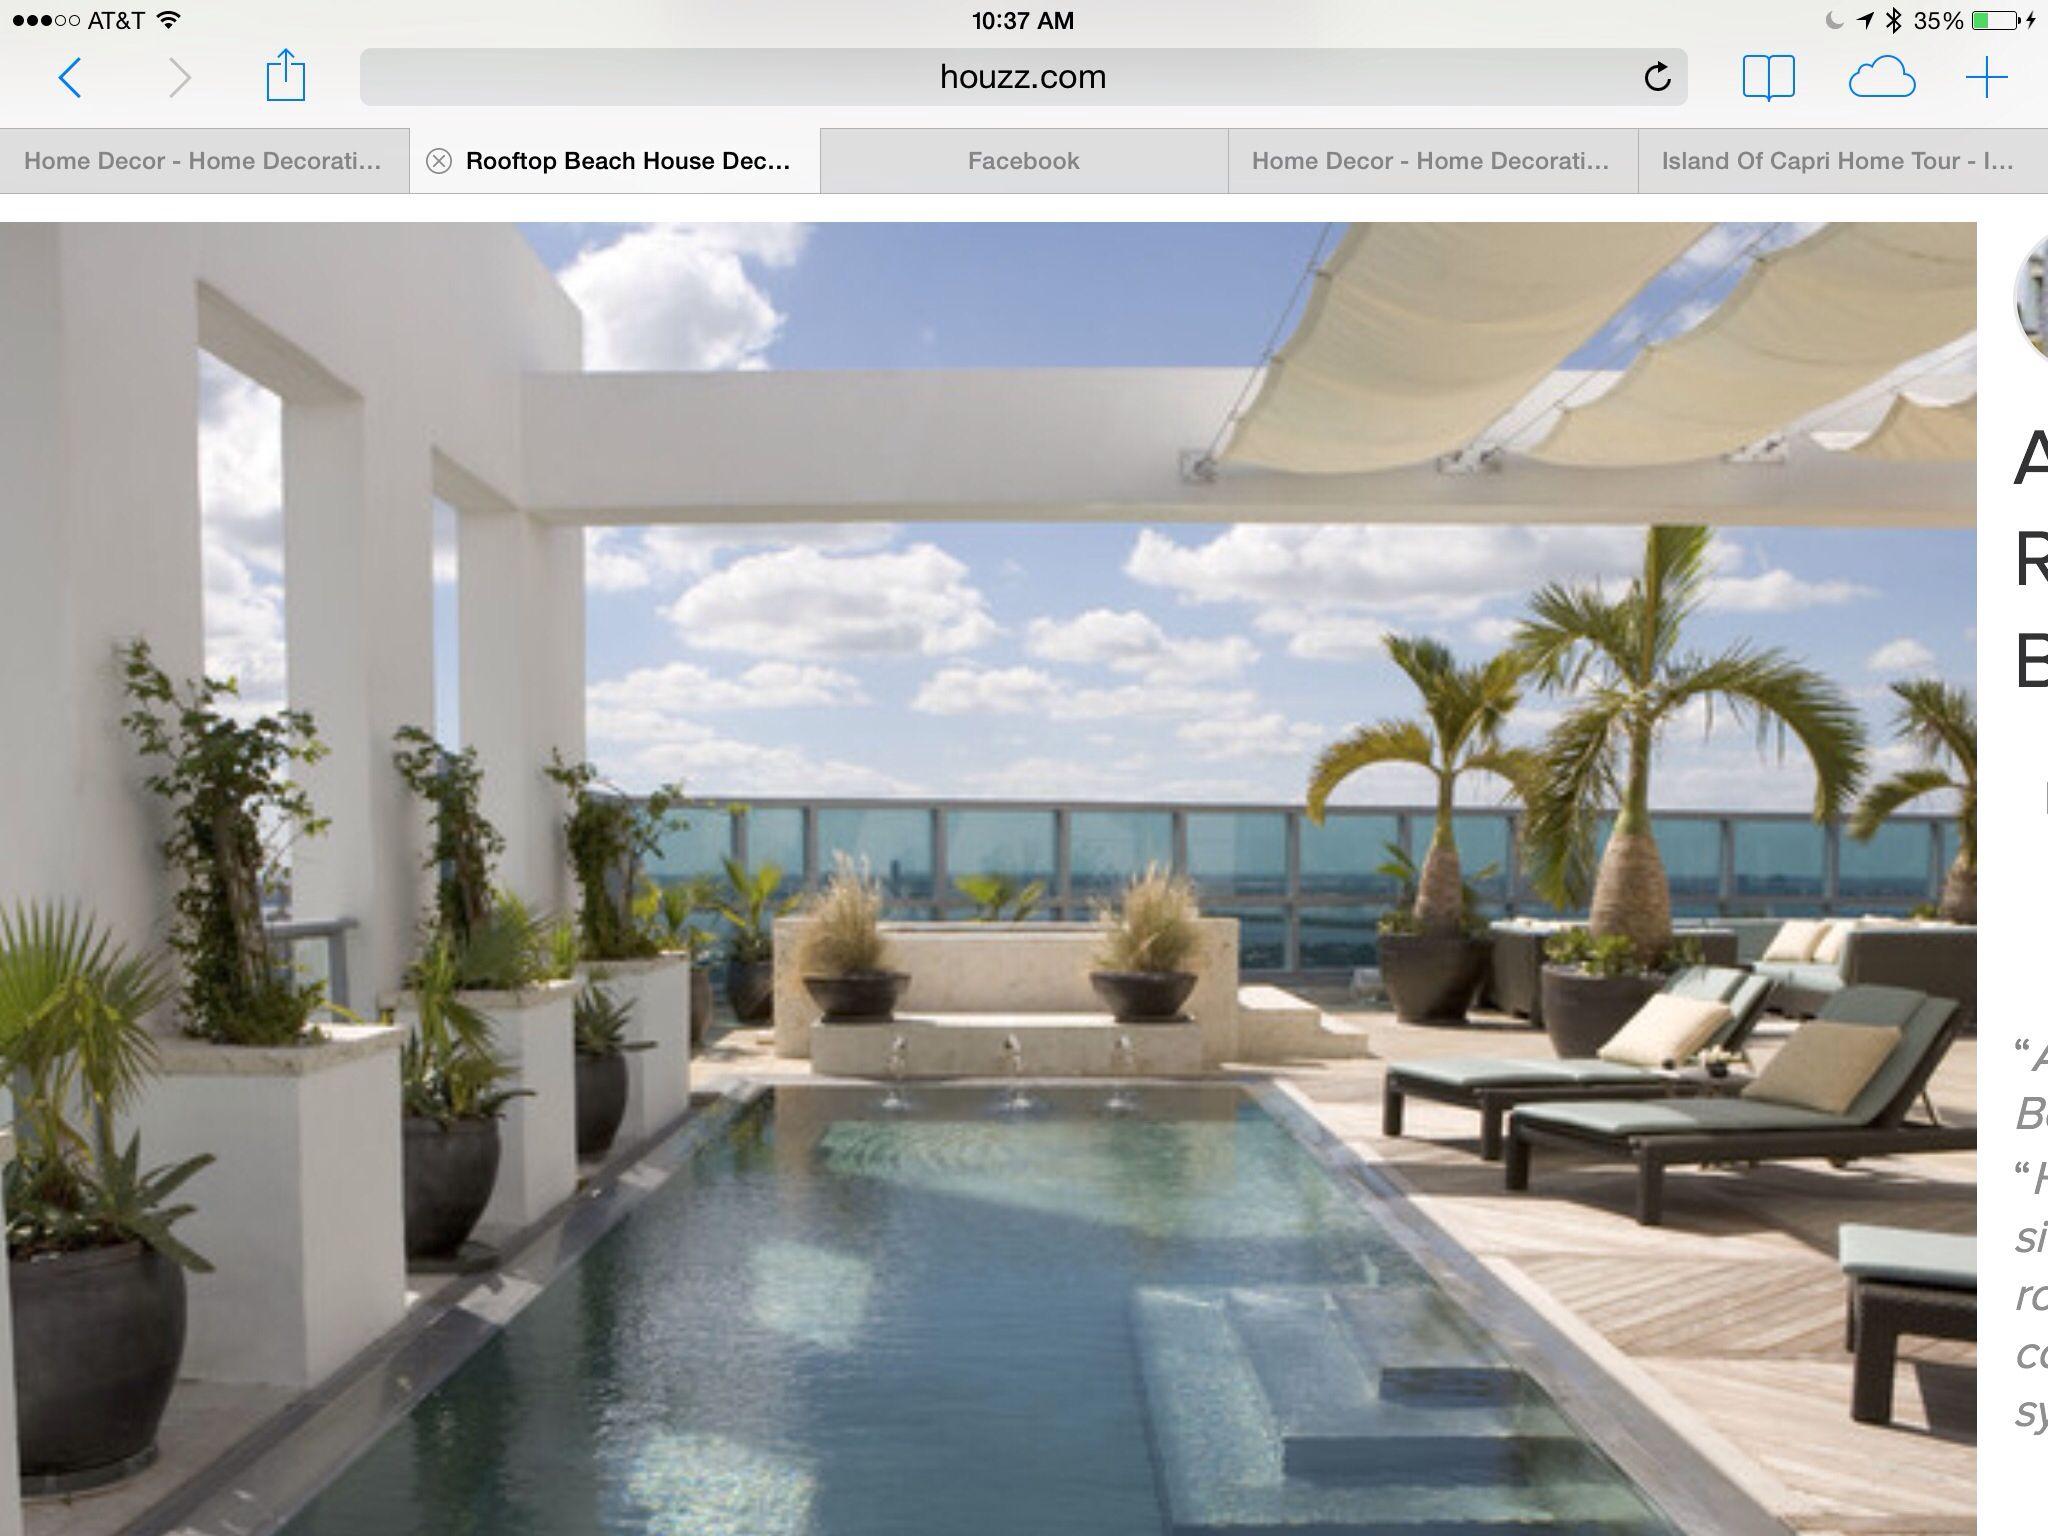 Roof Top Pool & Border Wall